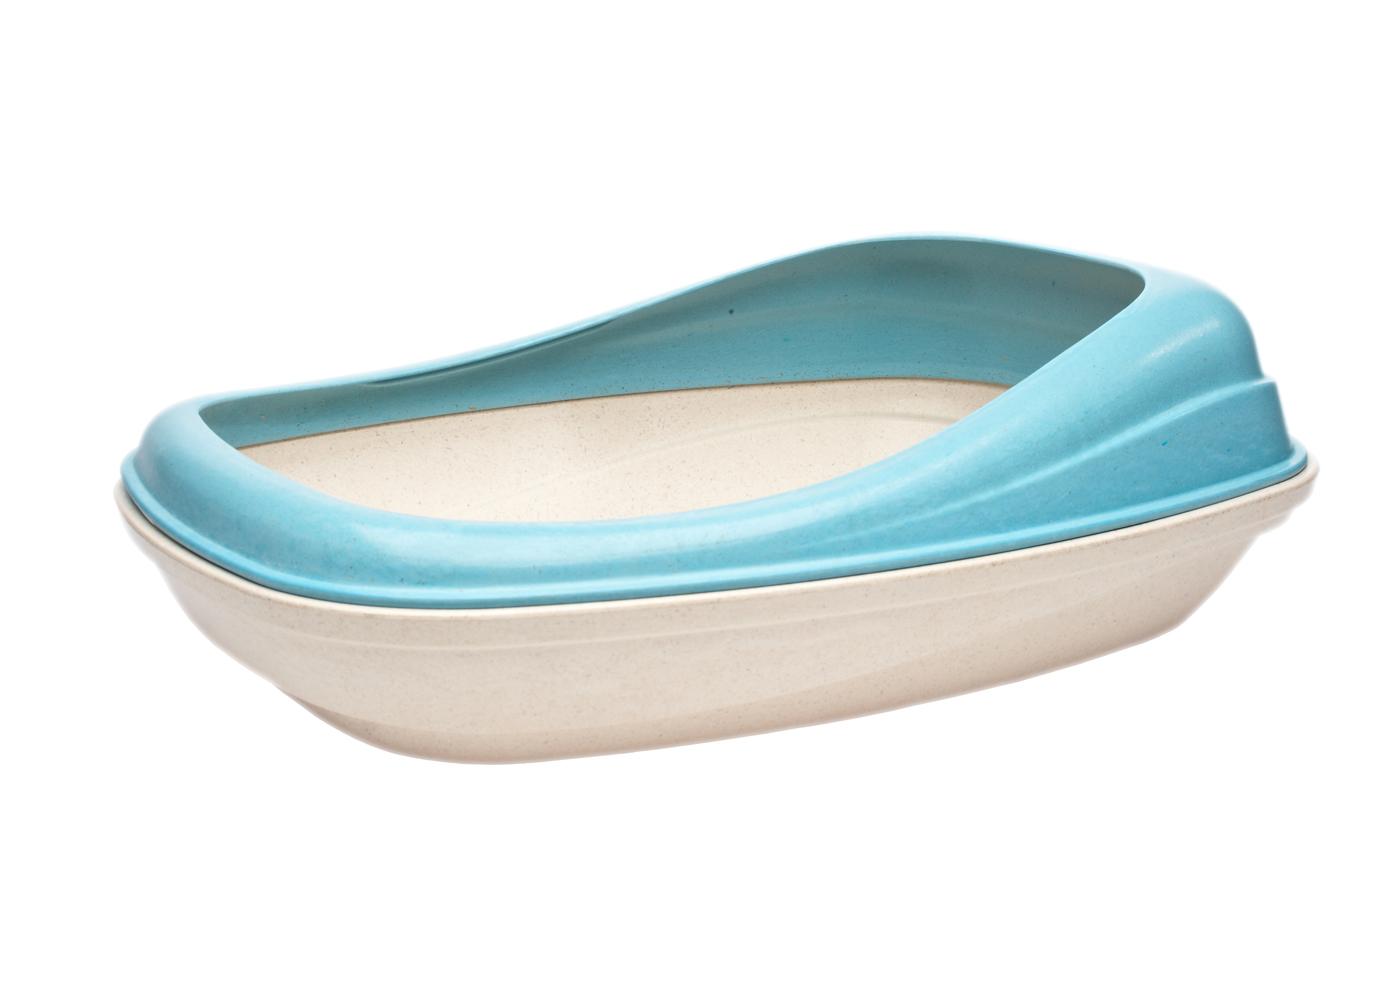 Beco Tray Cat Litter Pan, Blue